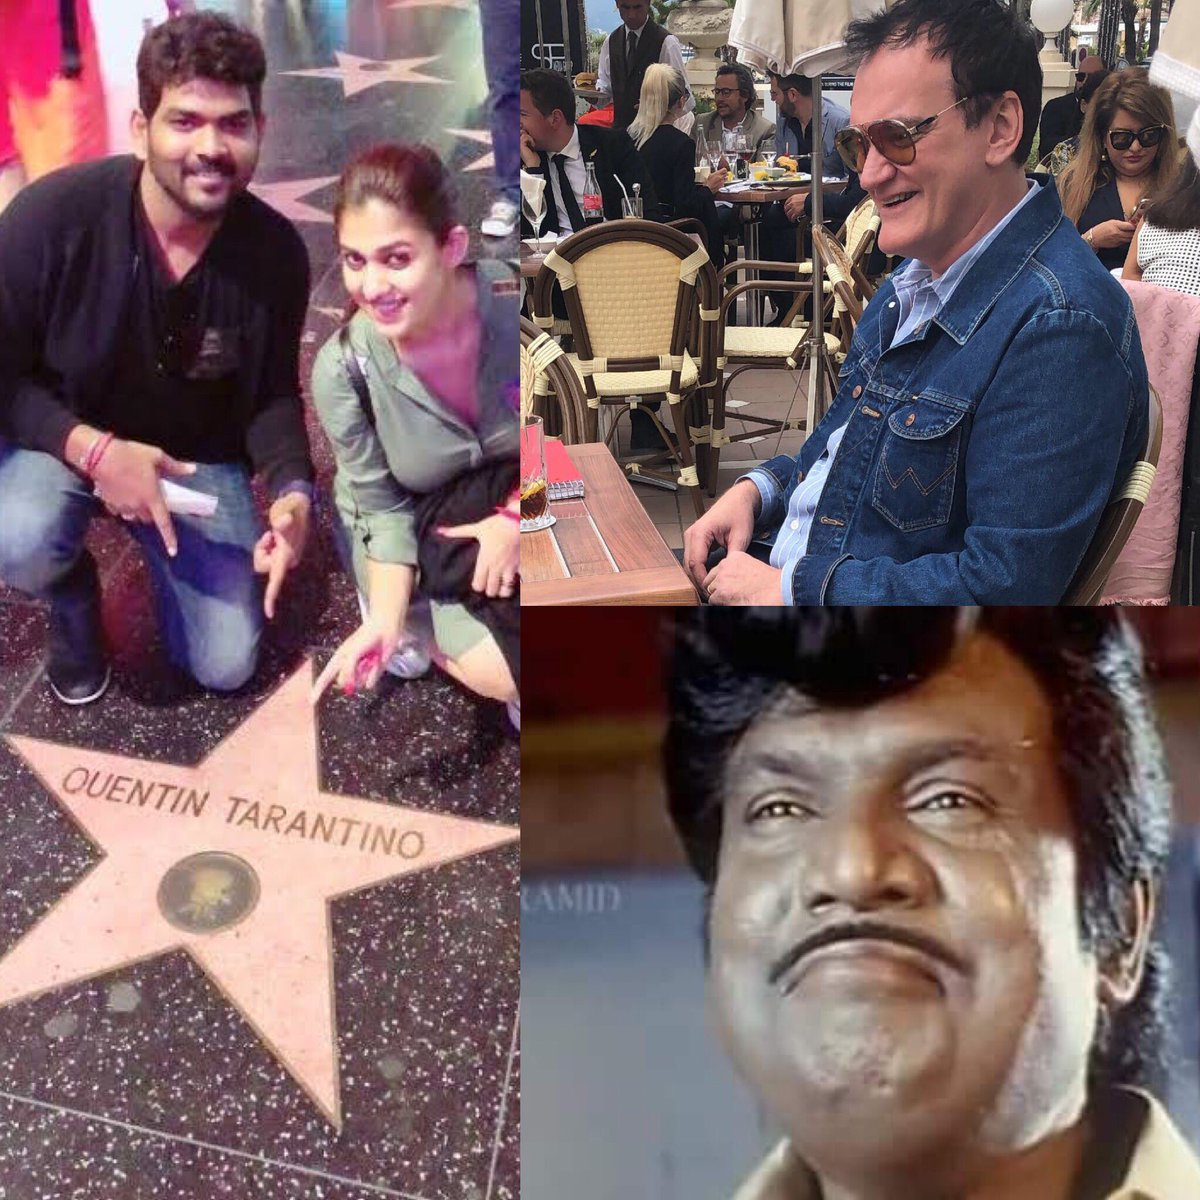 Vignesh Shivan Nayanthara Quentin Tarantino Once Upon A Time In Hollywood